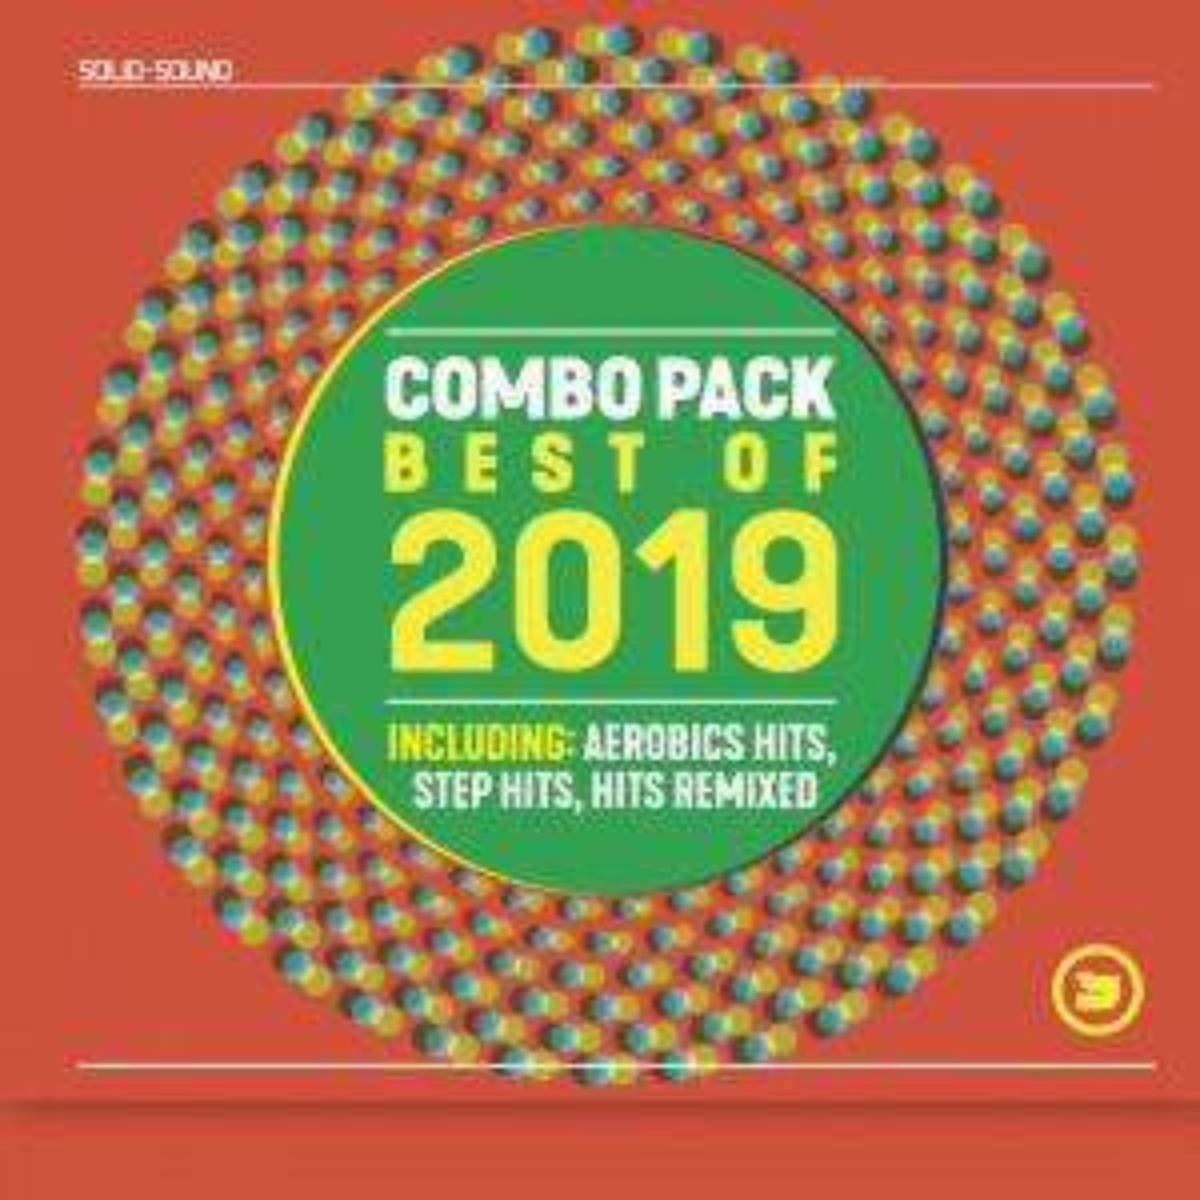 Combo pack: 3x BEST OF 2019 mixes